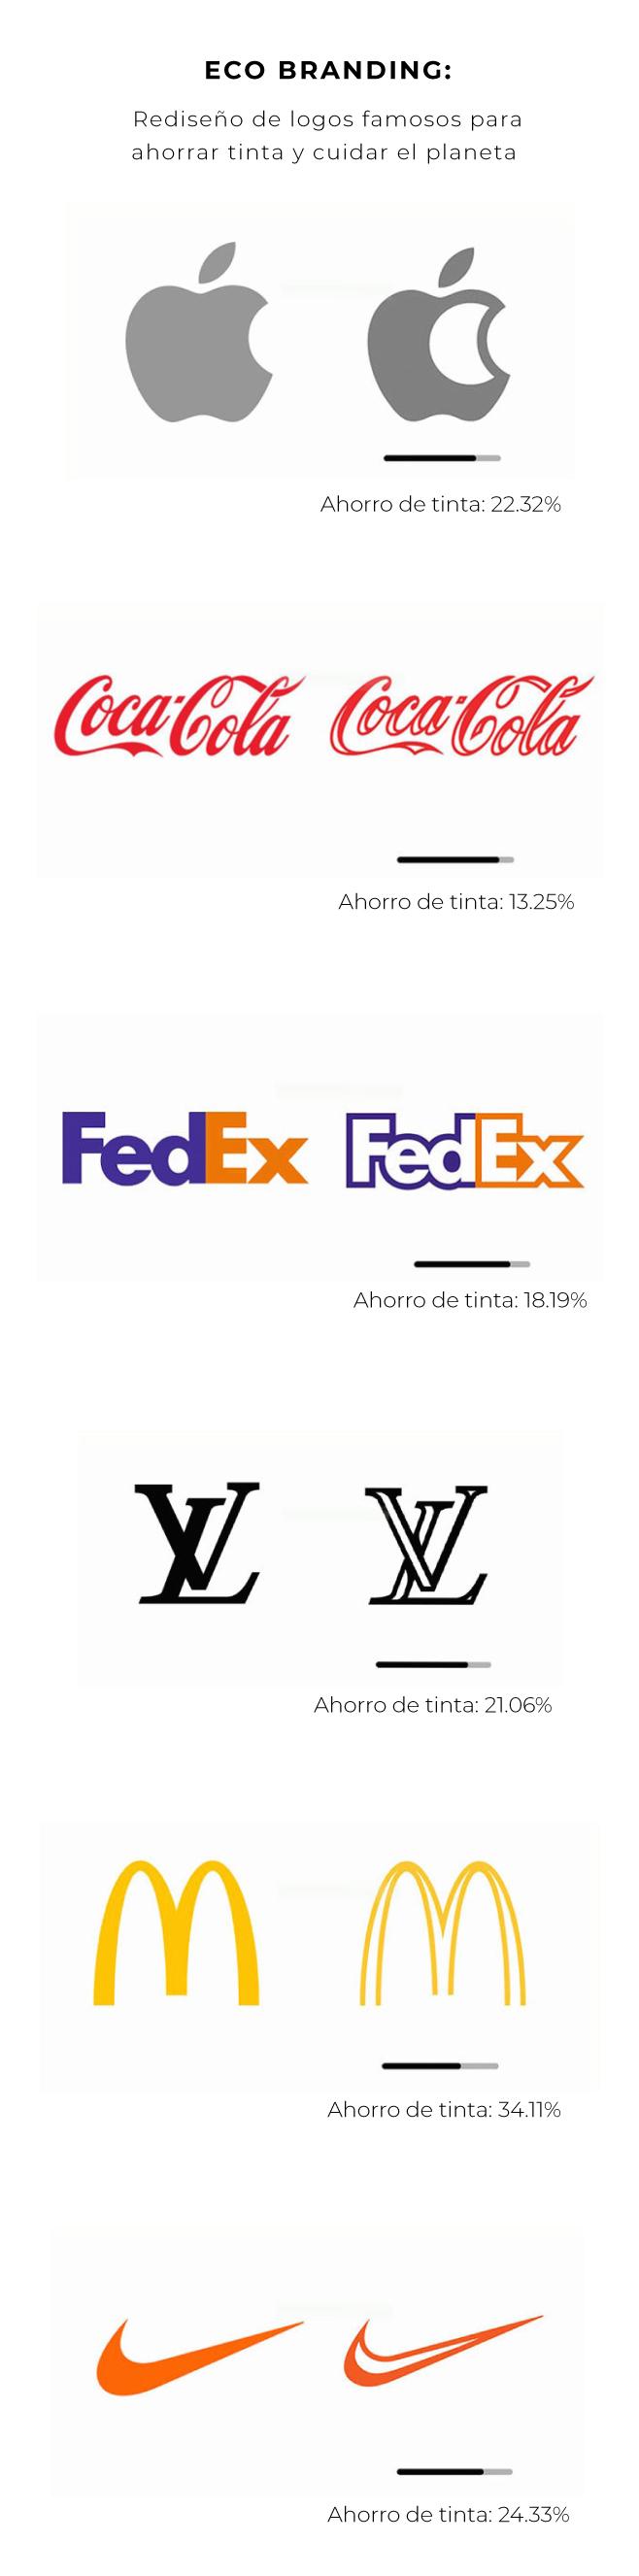 Ecobranding: Rediseño del logo famosos